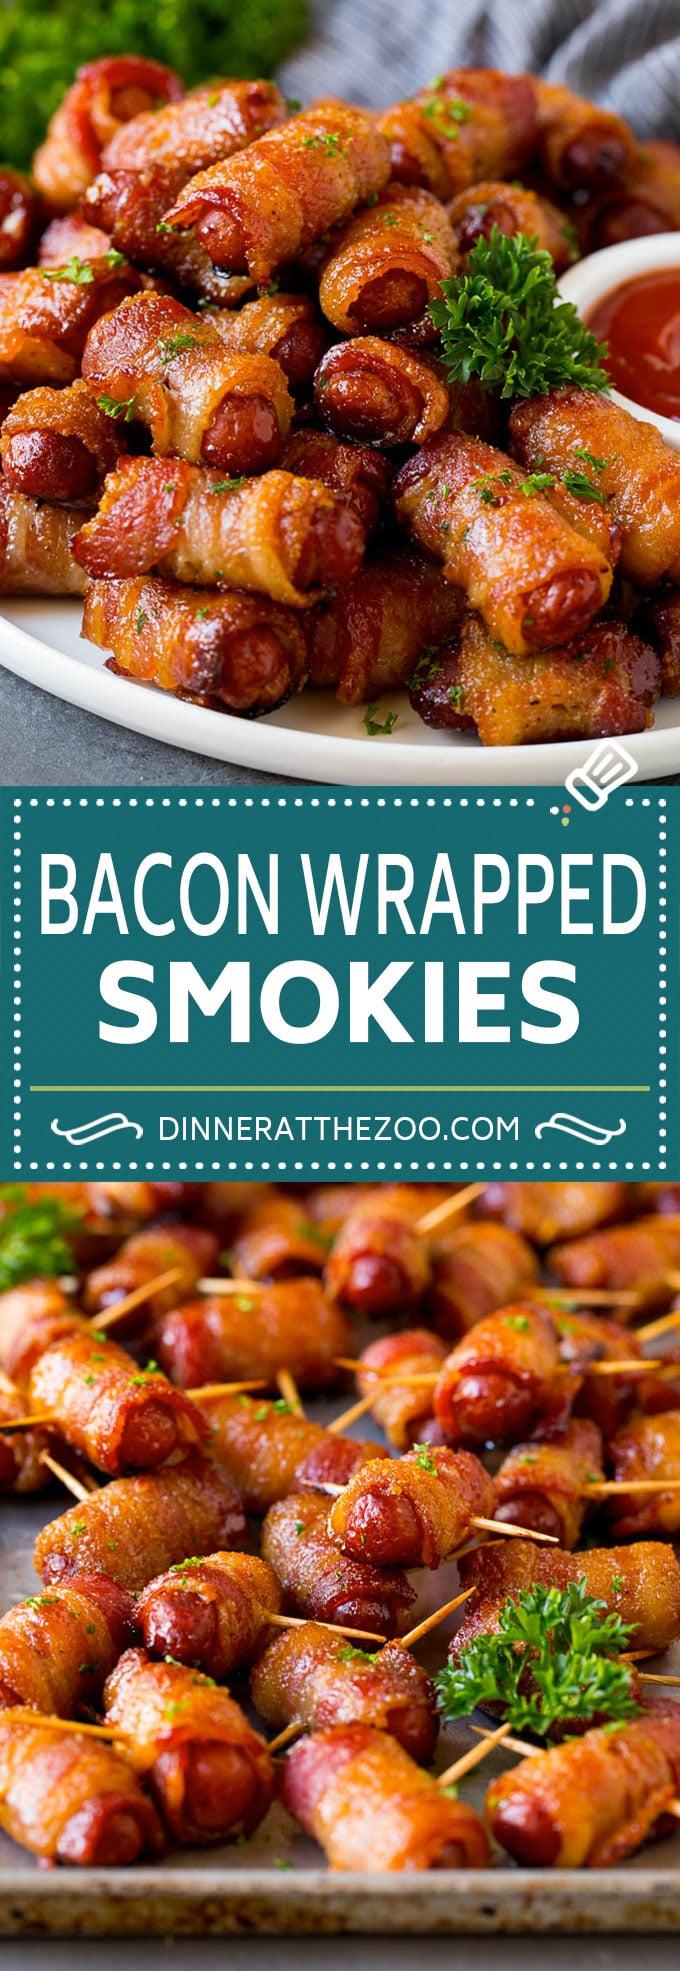 Bacon Wrapped Smokies Recipe #appetizer #bacon #sausage #dinneratthezoo